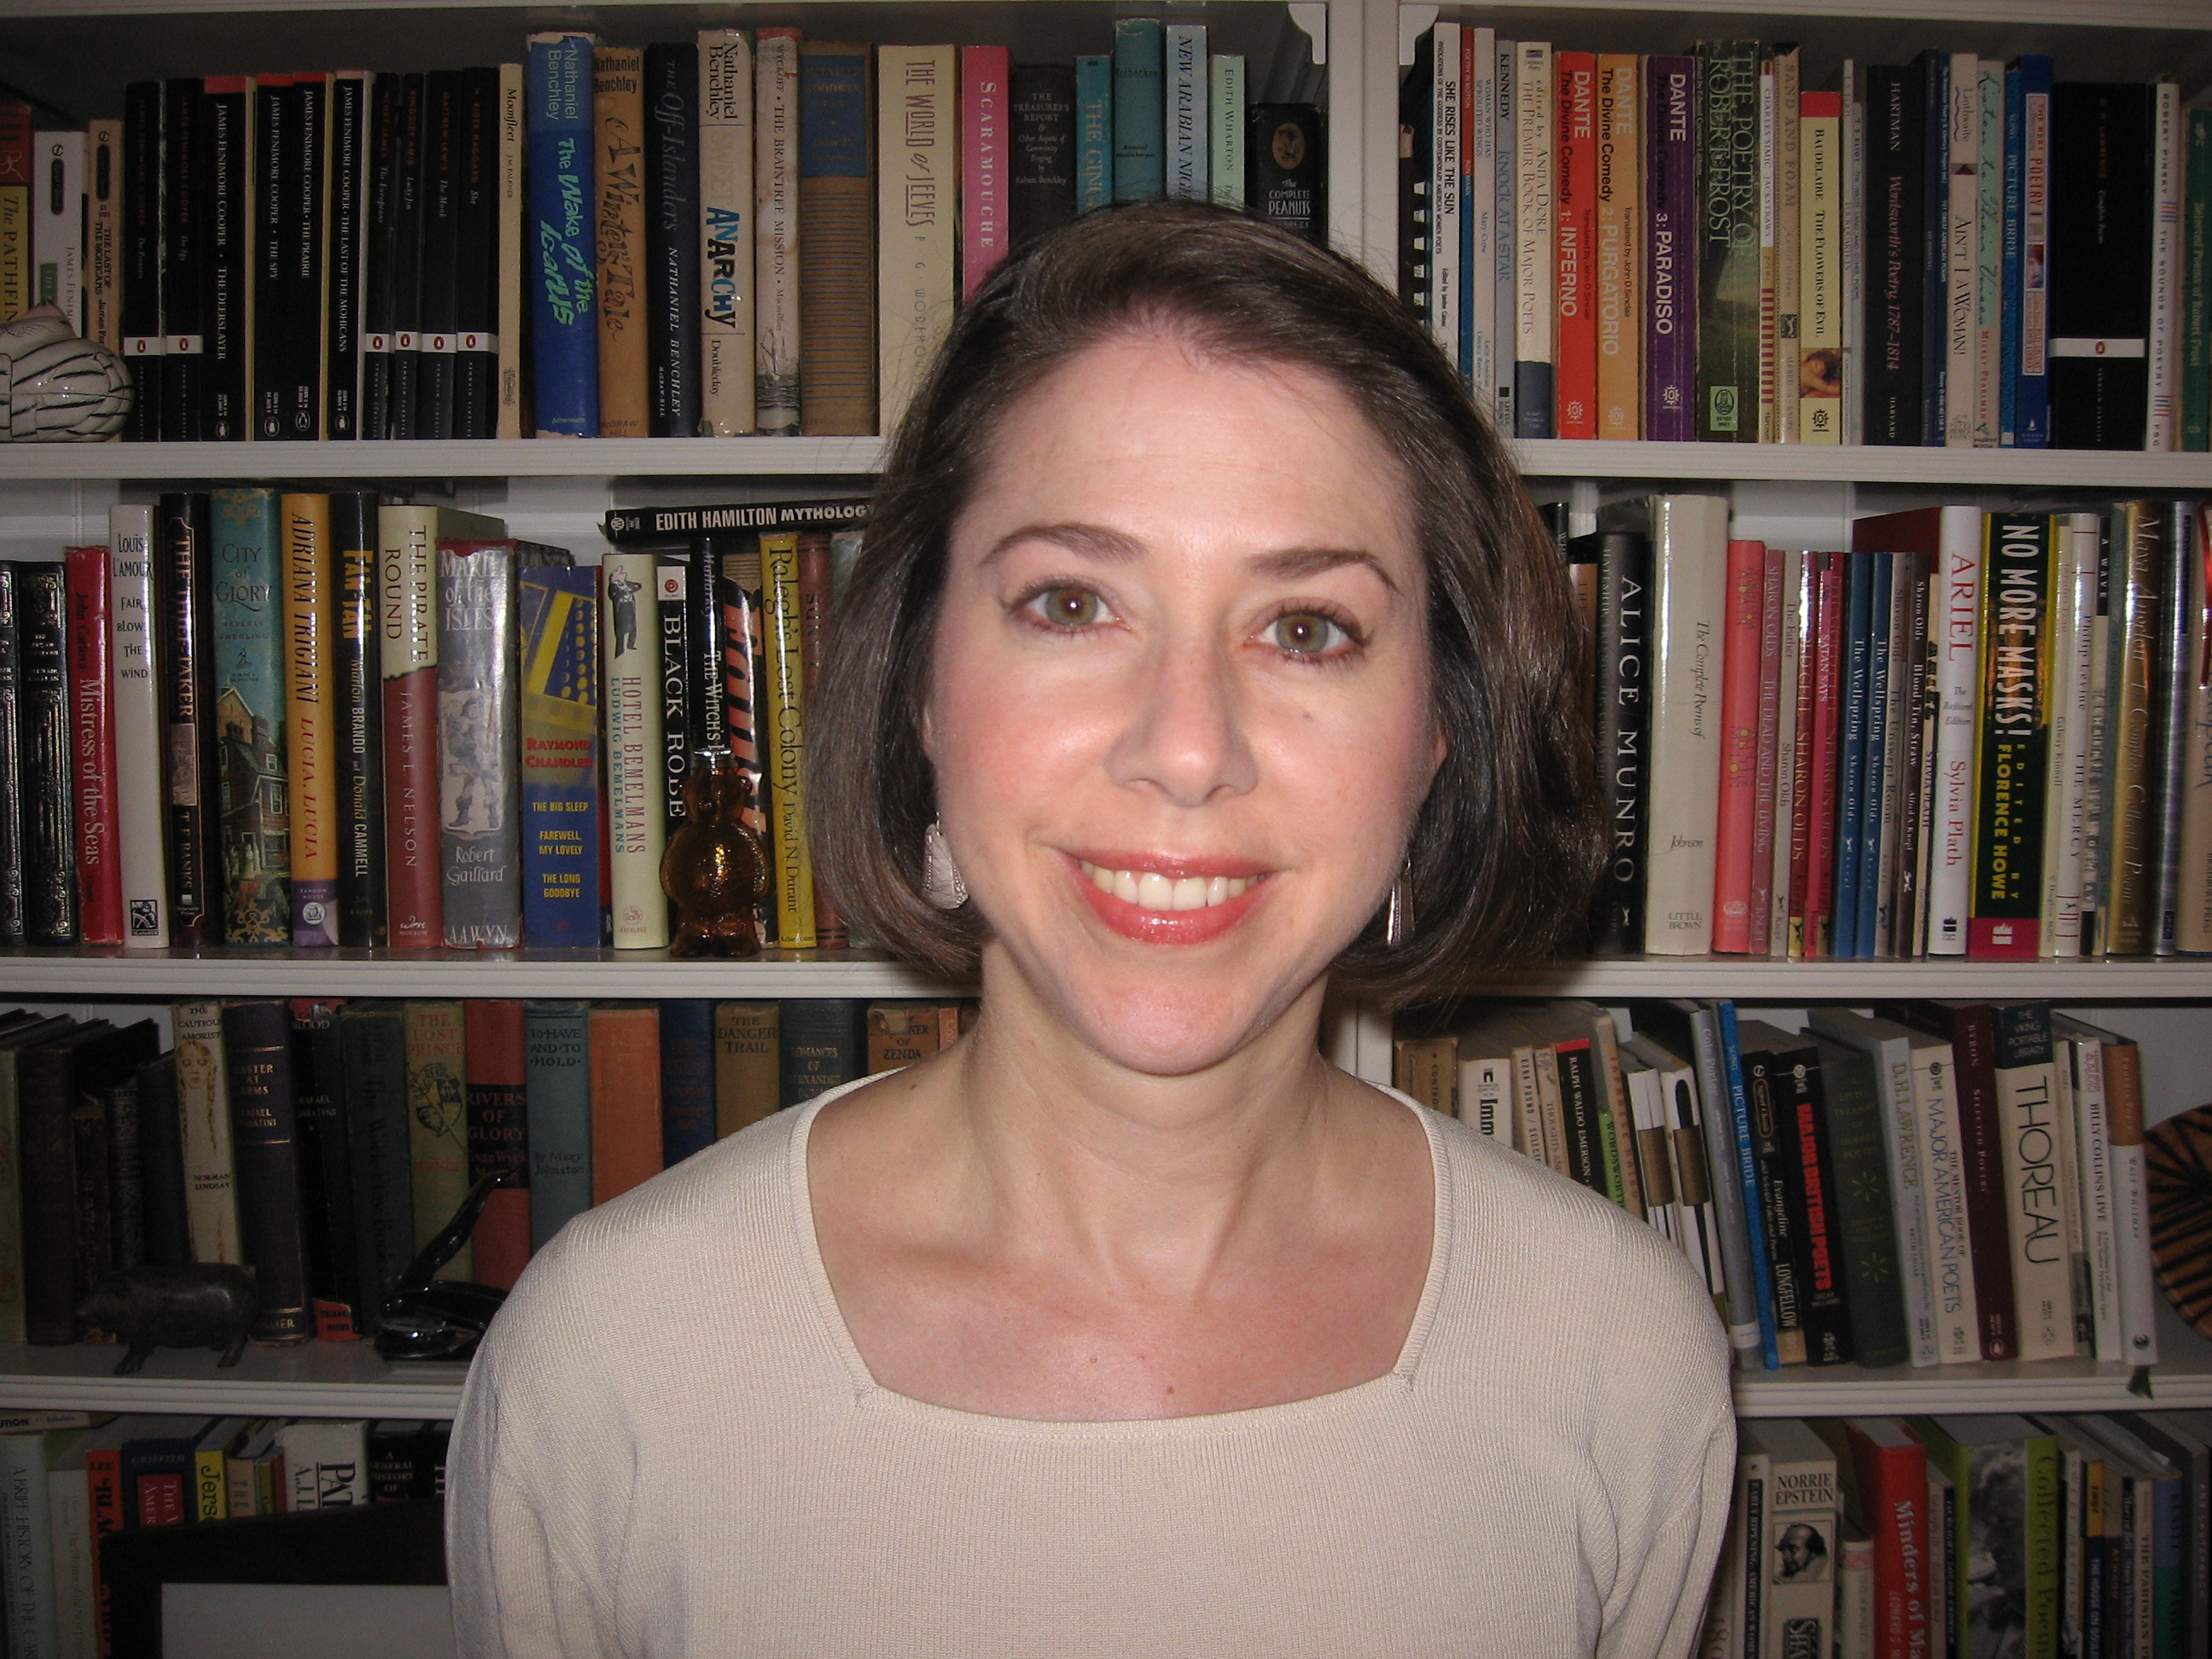 Meredith Mundy